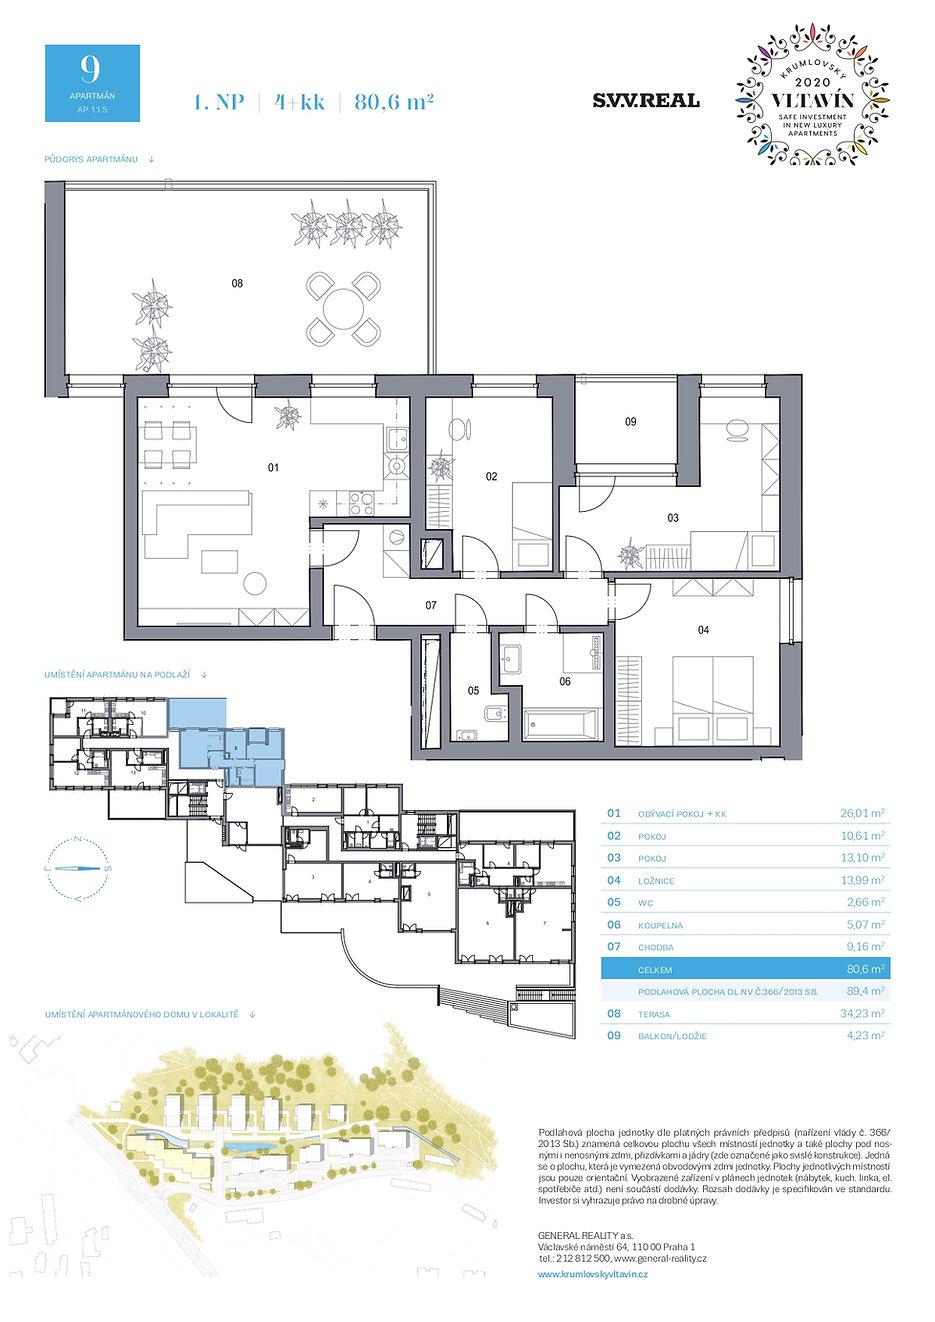 GR_krumlovsky-vltavin_bytove-karty-apartmany_1NP_A09_page-0001.jpg